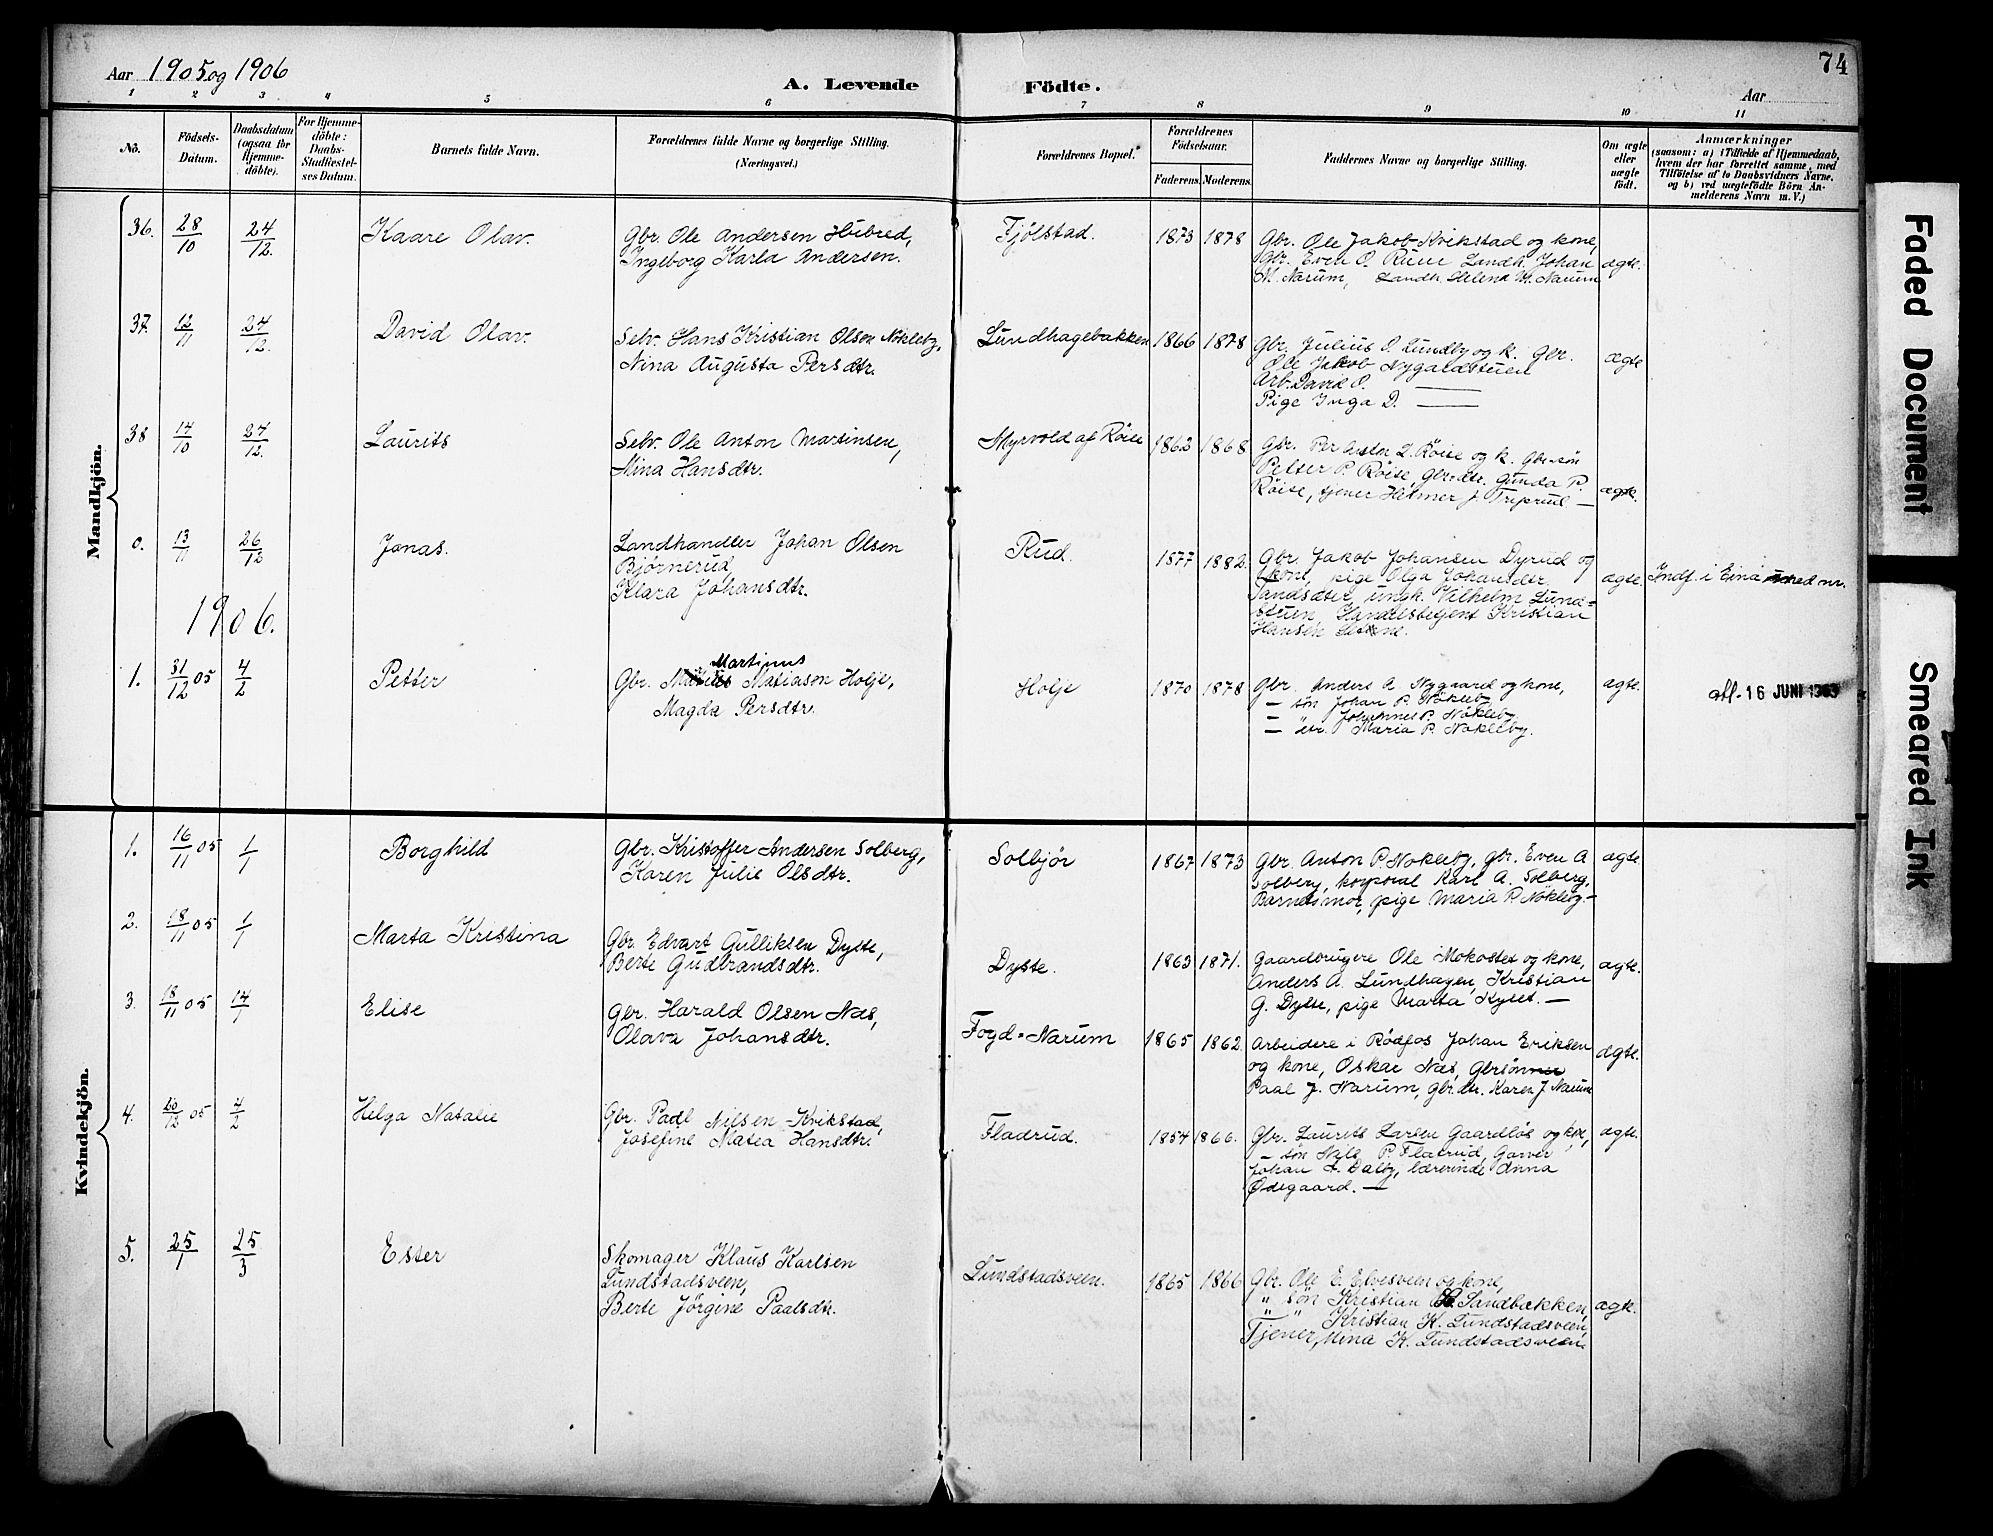 SAH, Vestre Toten prestekontor, H/Ha/Haa/L0013: Parish register (official) no. 13, 1895-1911, p. 74